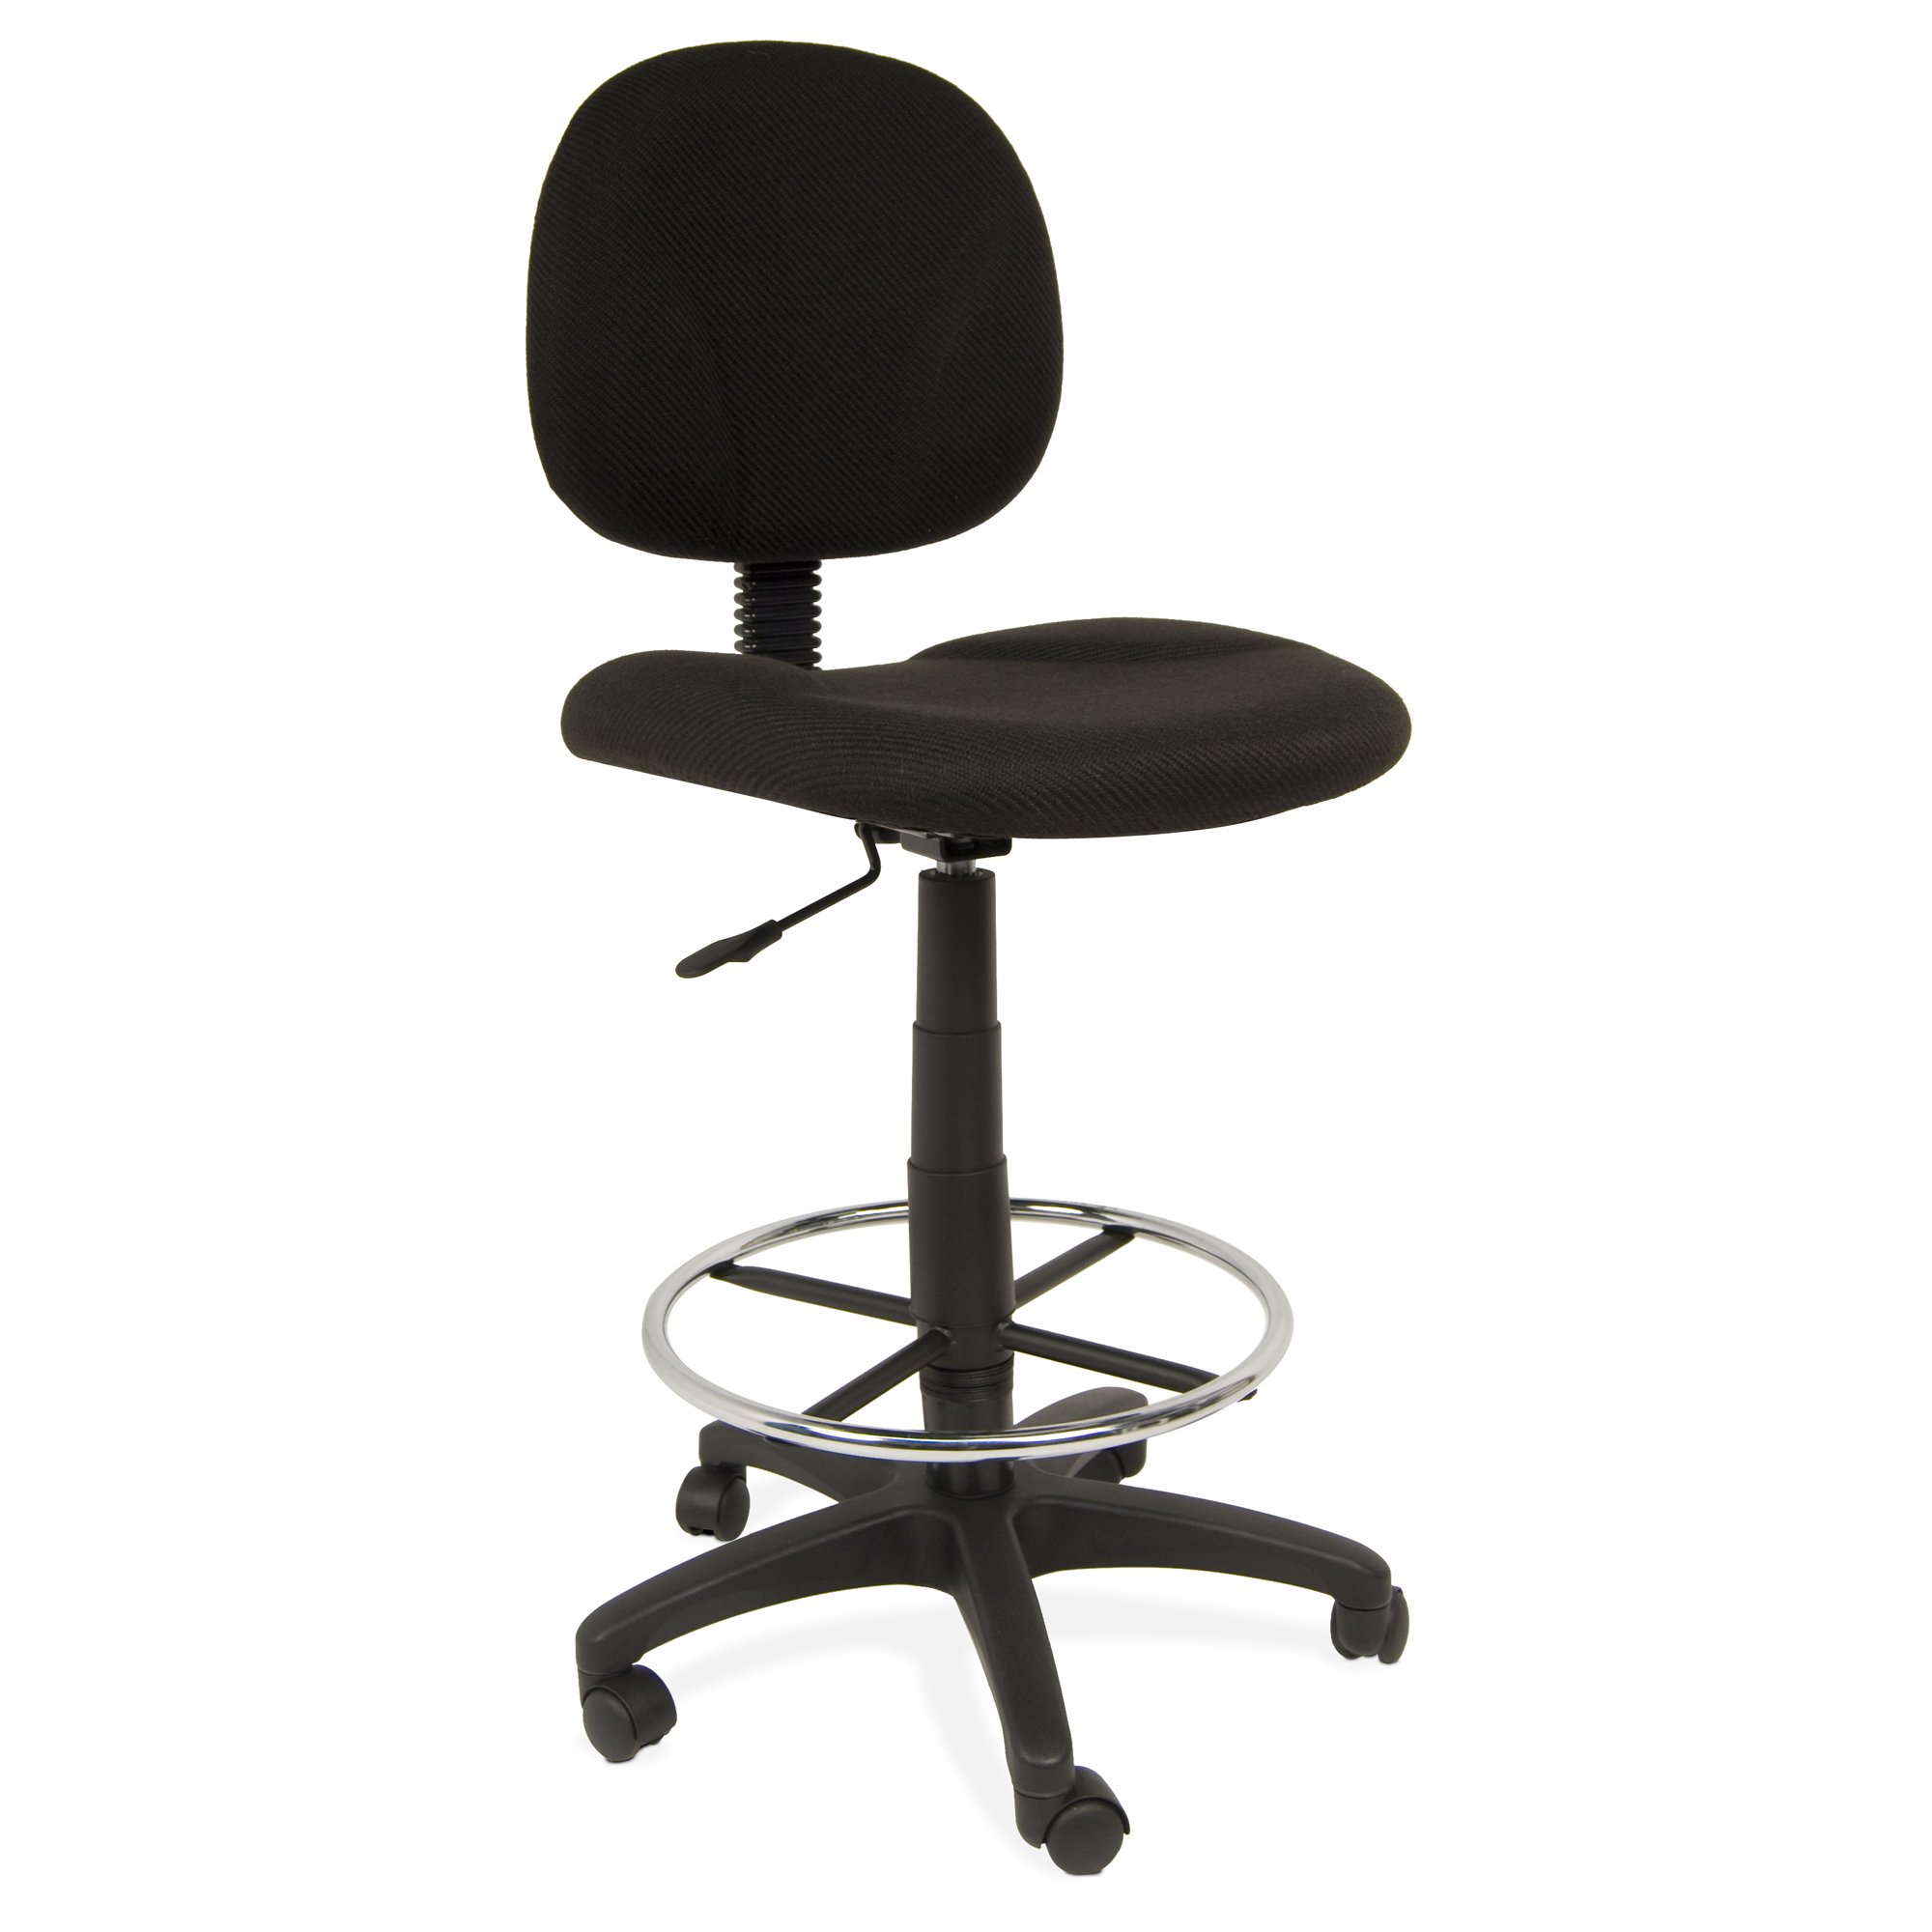 Studio Designs Ergo Pro Chair in Black 18409 by STUDIO DESIGNS INSPIRING CREATIVITY WWW.STUDIODESIGNS.COM